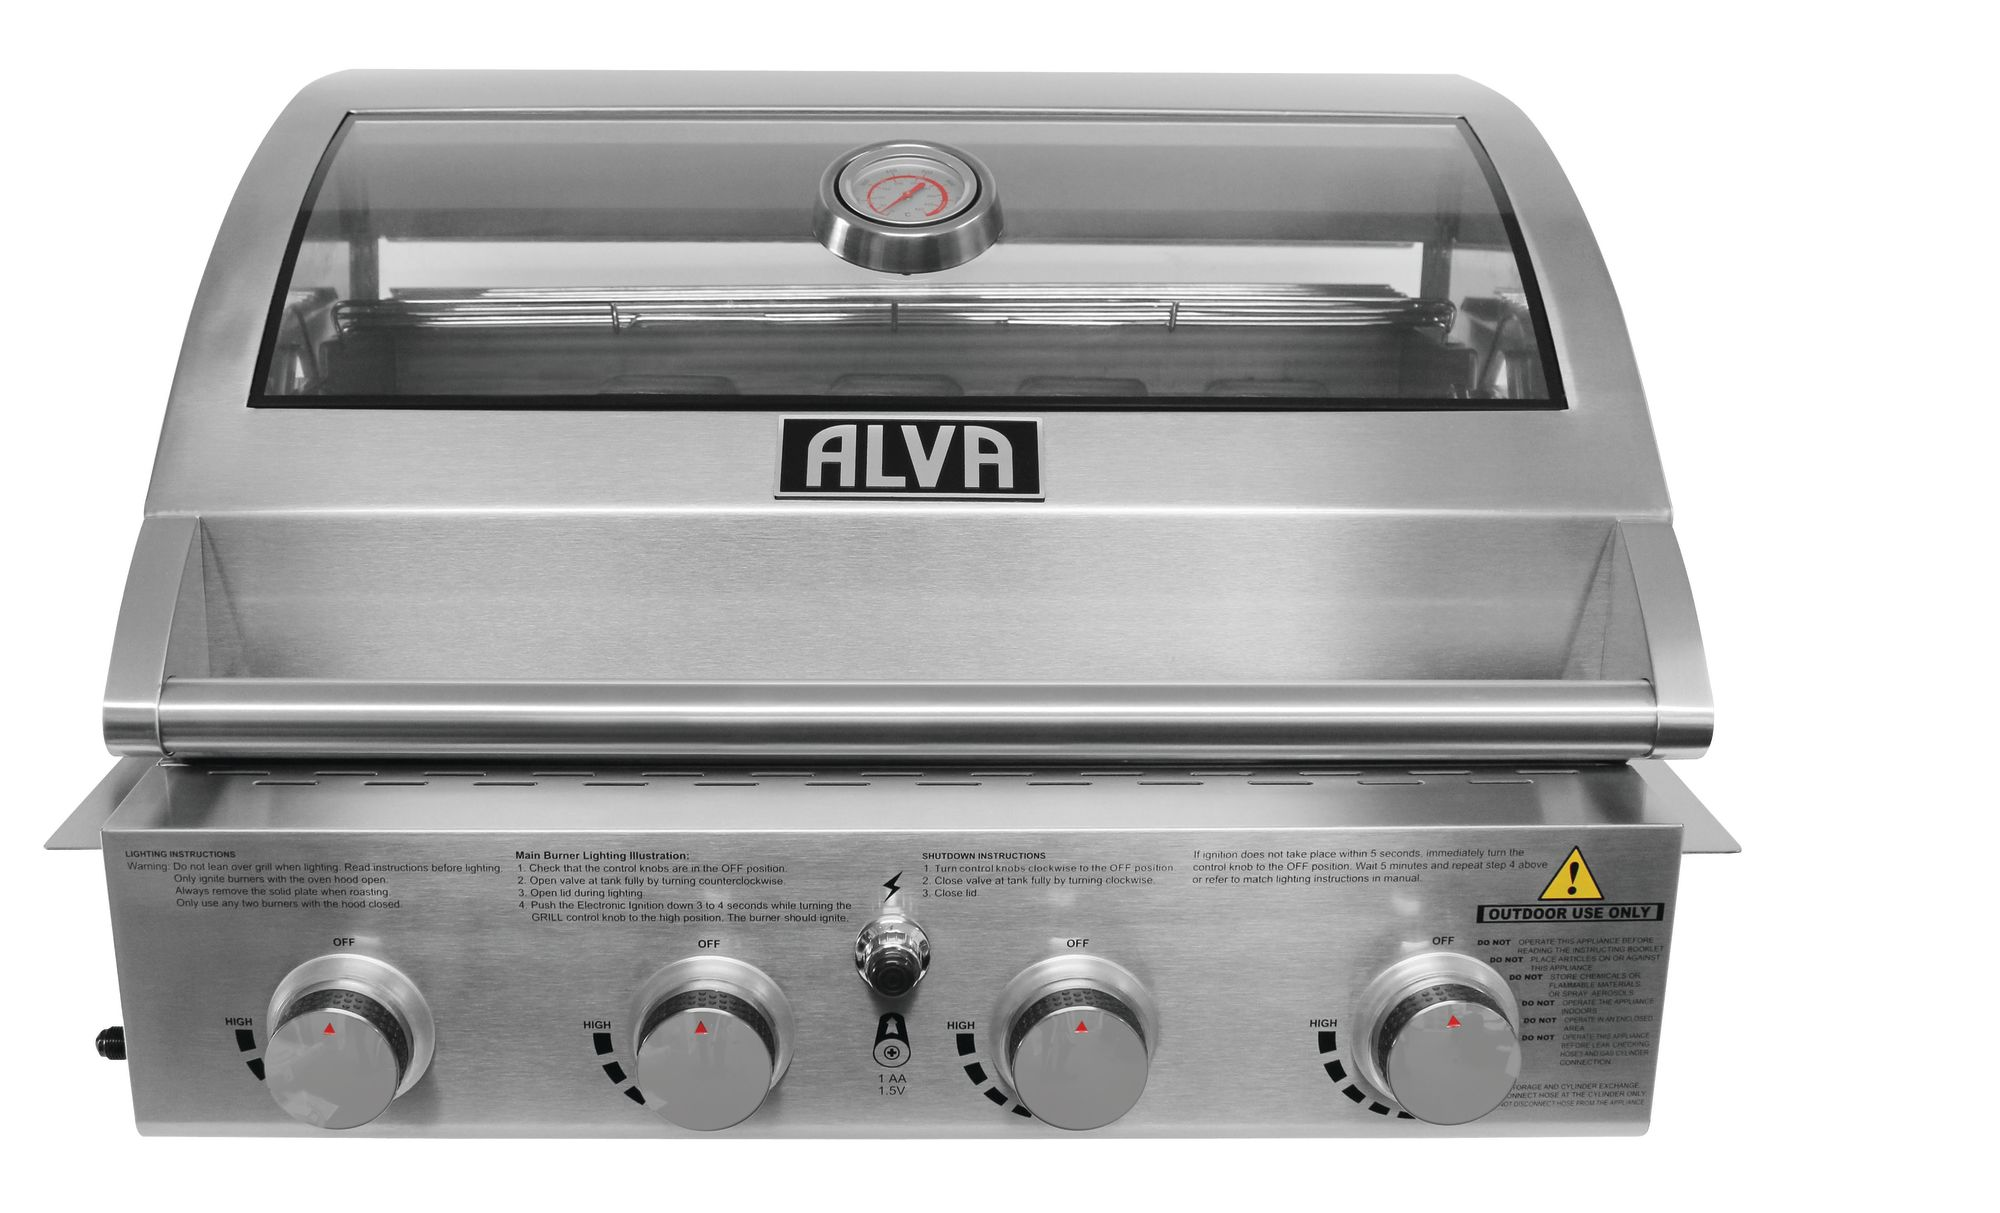 Alva - Mojave 4 Burner Drop-In Gas BBQ